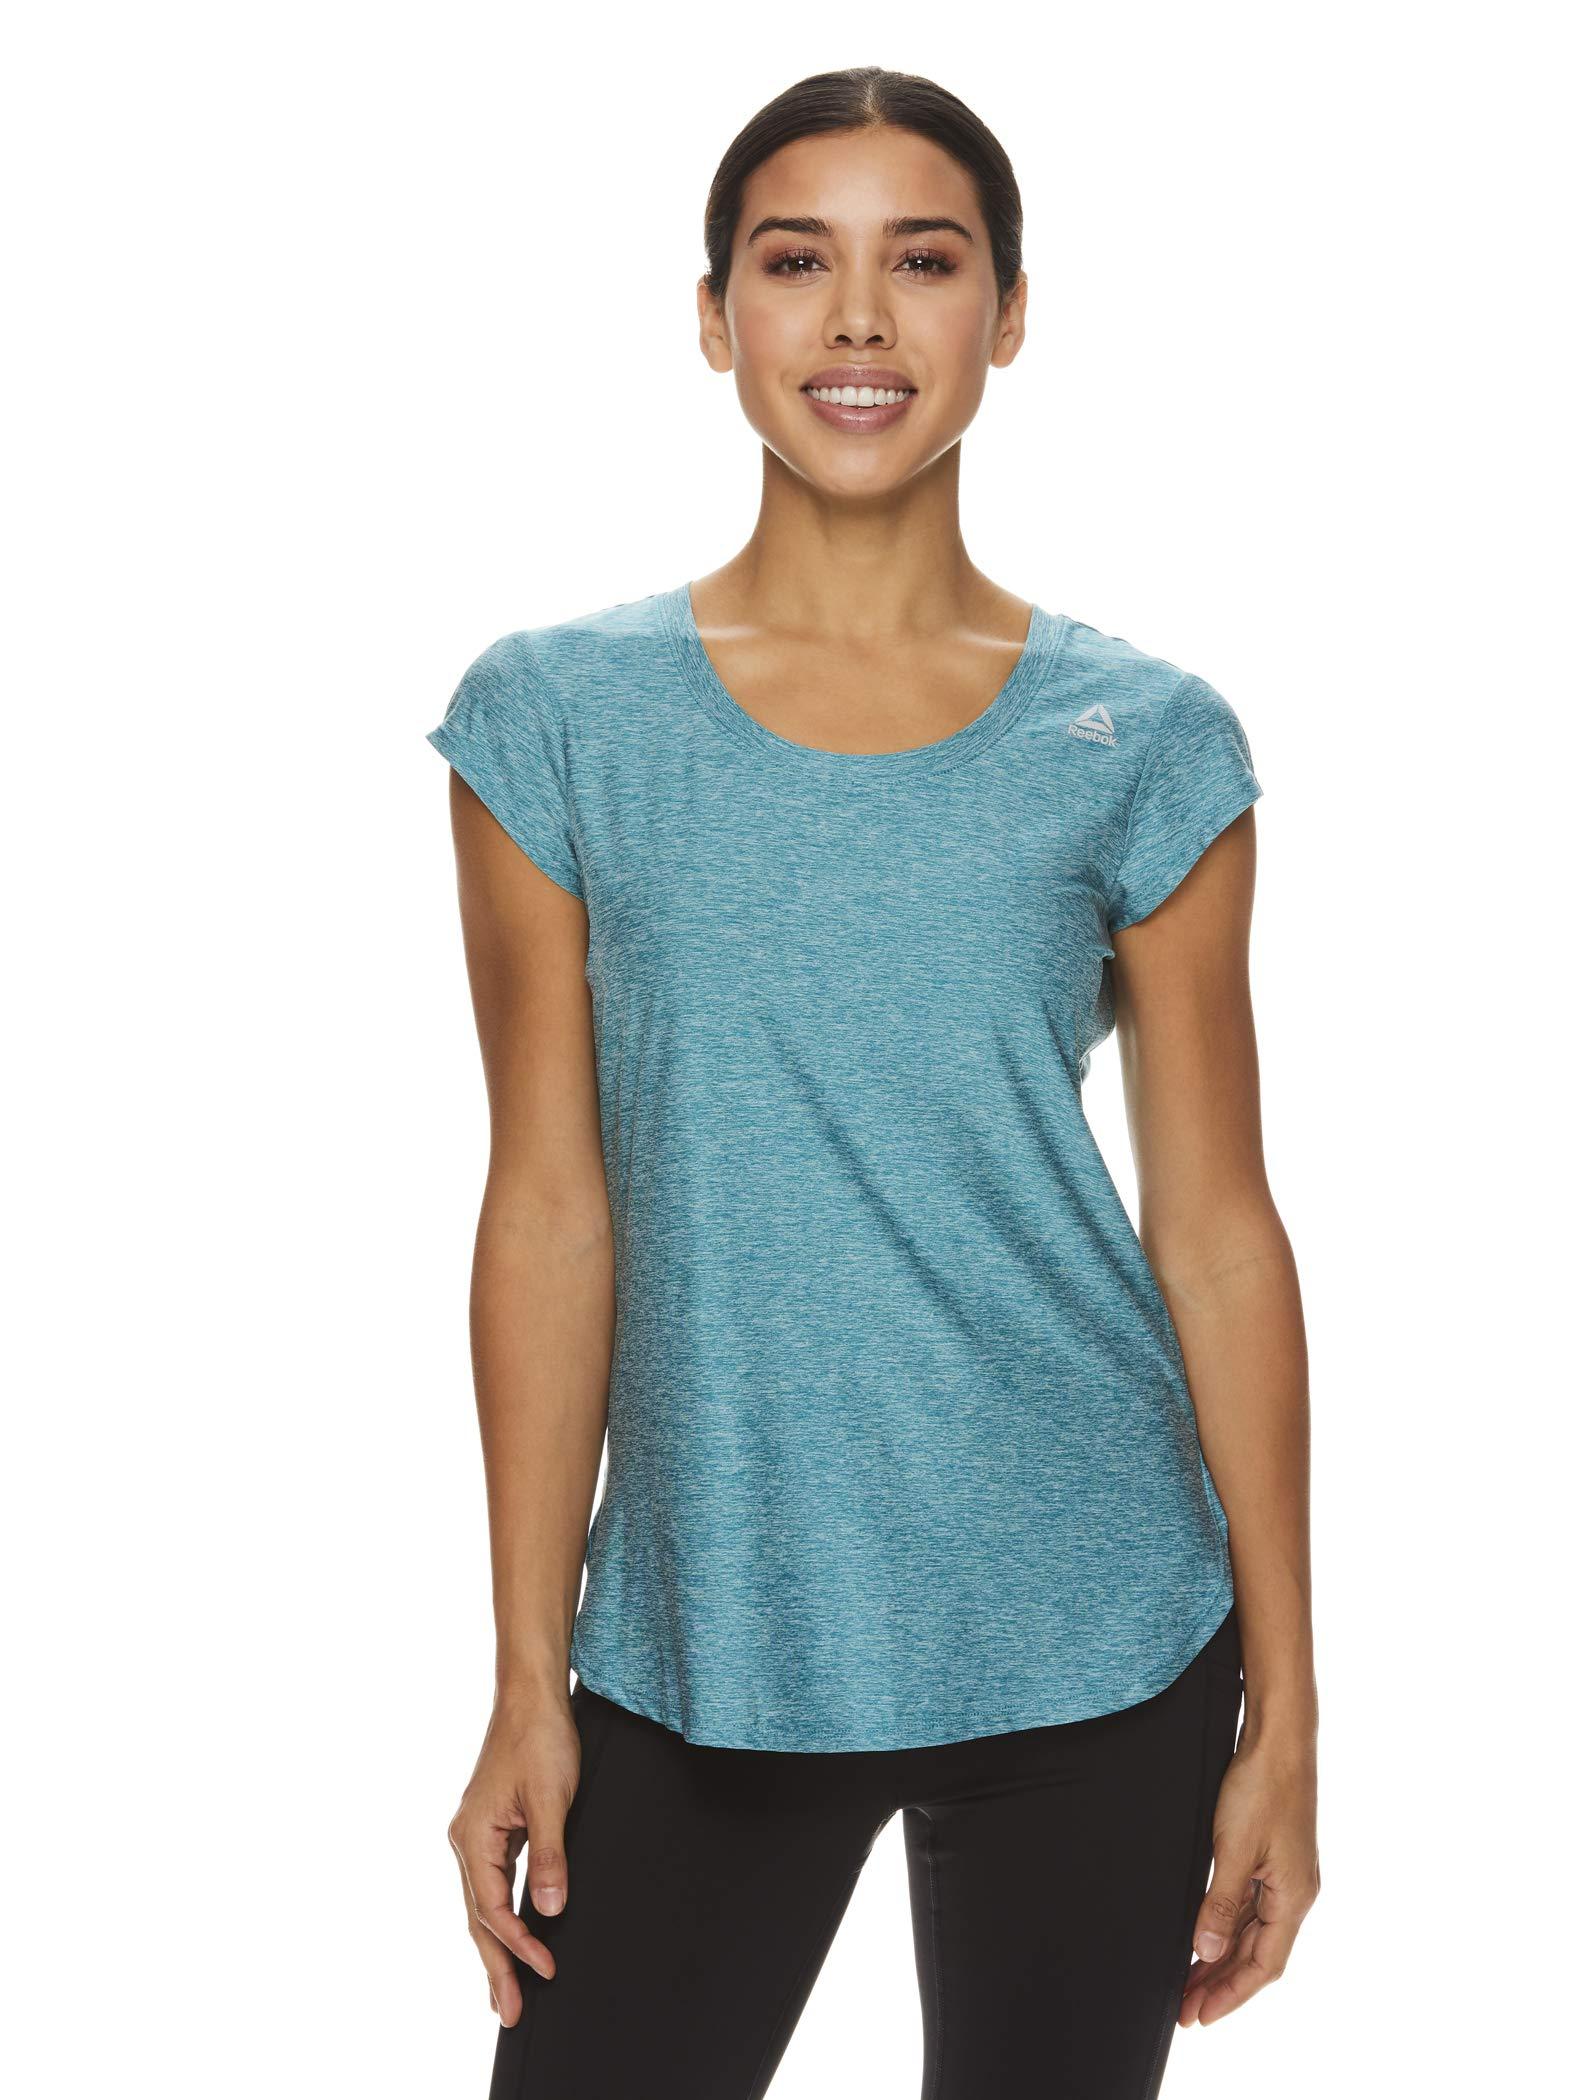 Reebok Women's Legend Running & Gym T-Shirt - Performance Short Sleeve Workout Clothes for Women - Harbor Blue Heather Legend Green, Small by Reebok